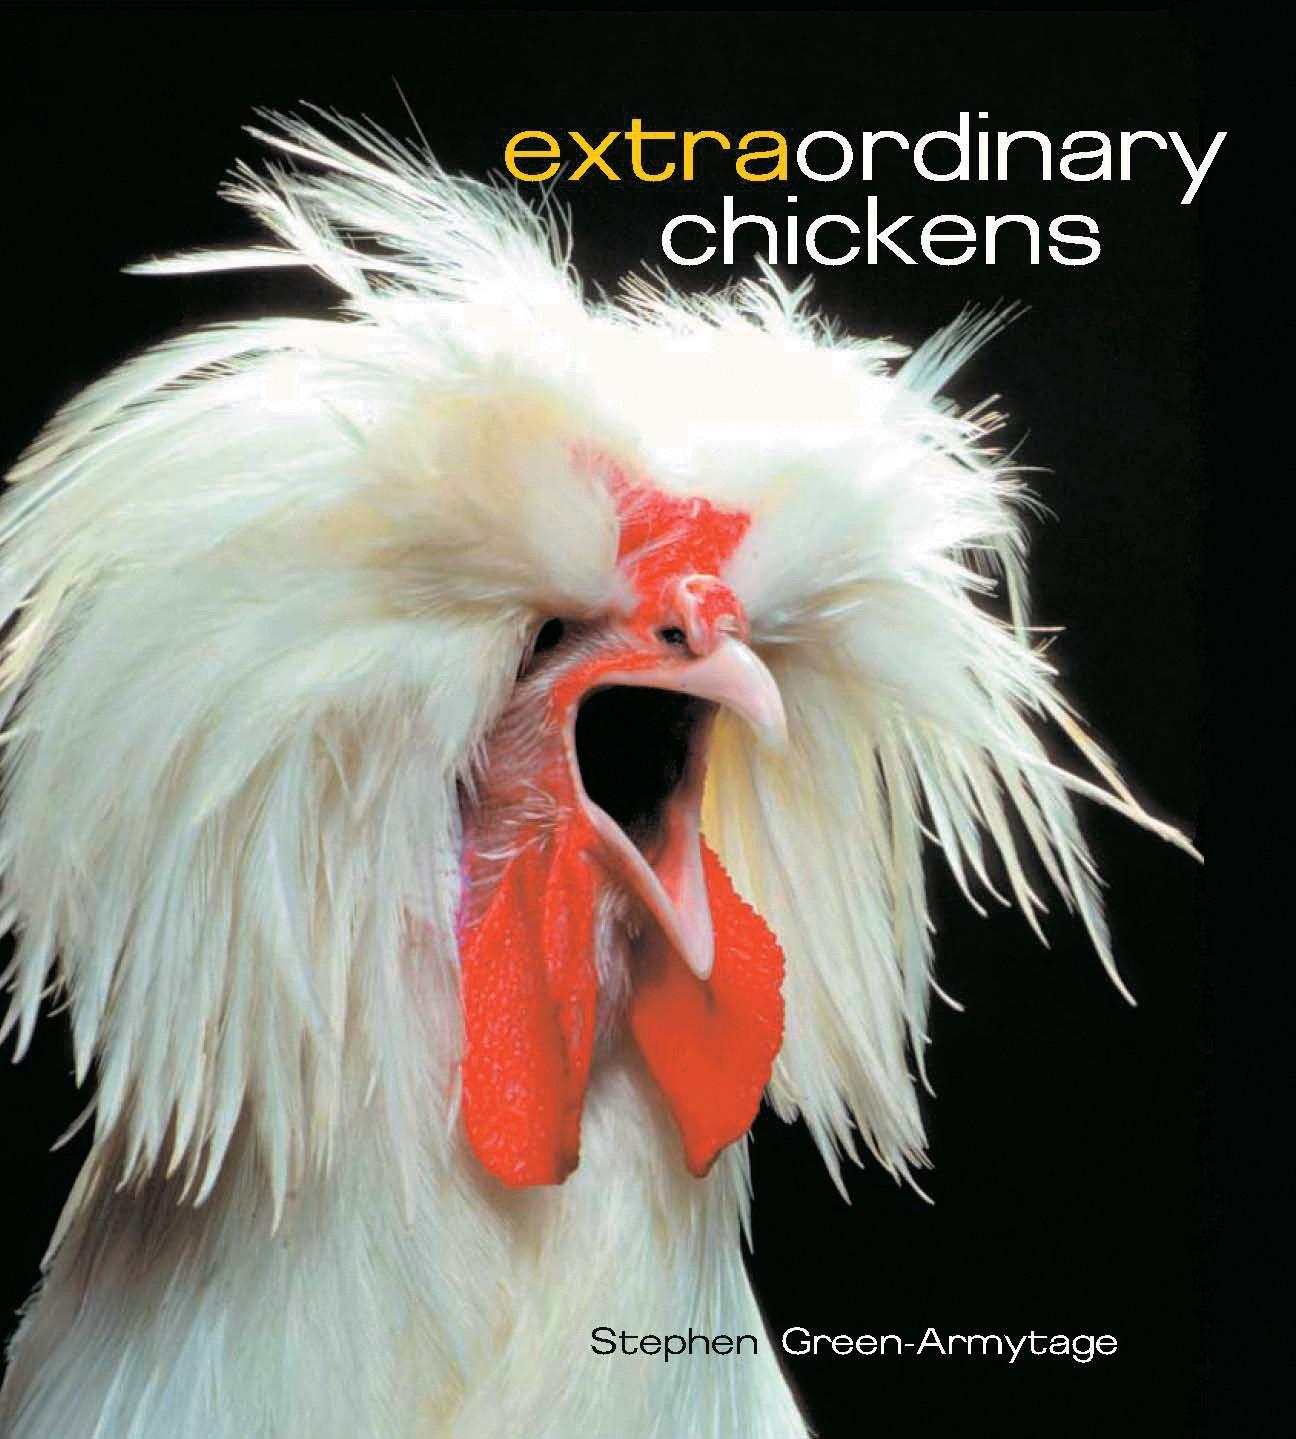 Extraordinary Chickens! It looks like I just found Adam Duritz's pet chicken.